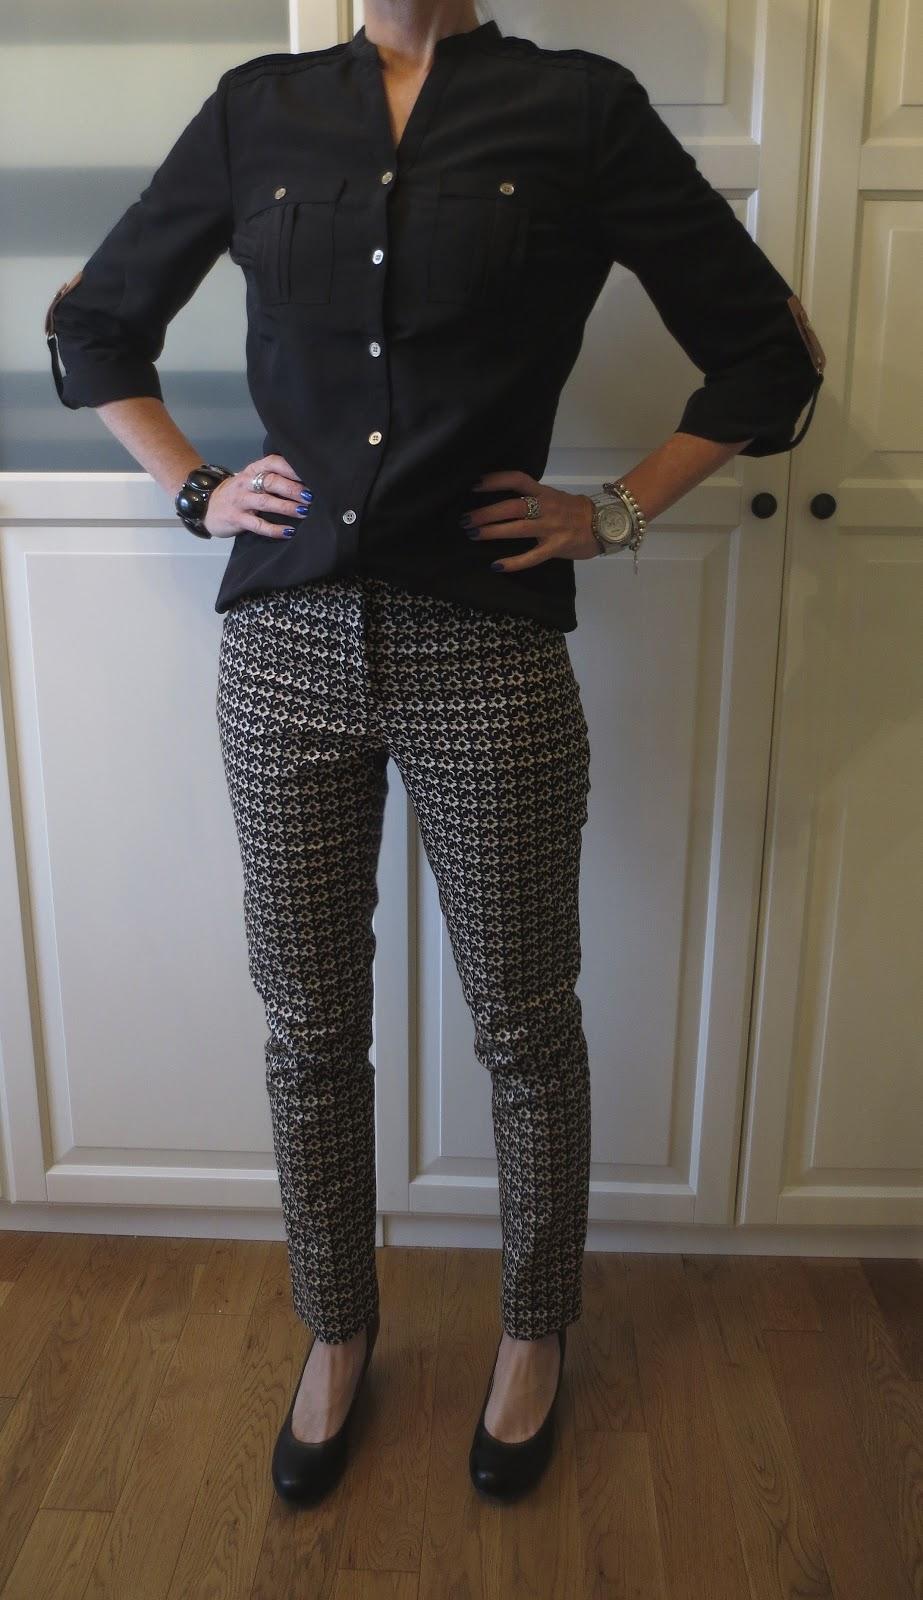 Pjm S Closet Patterned Pants